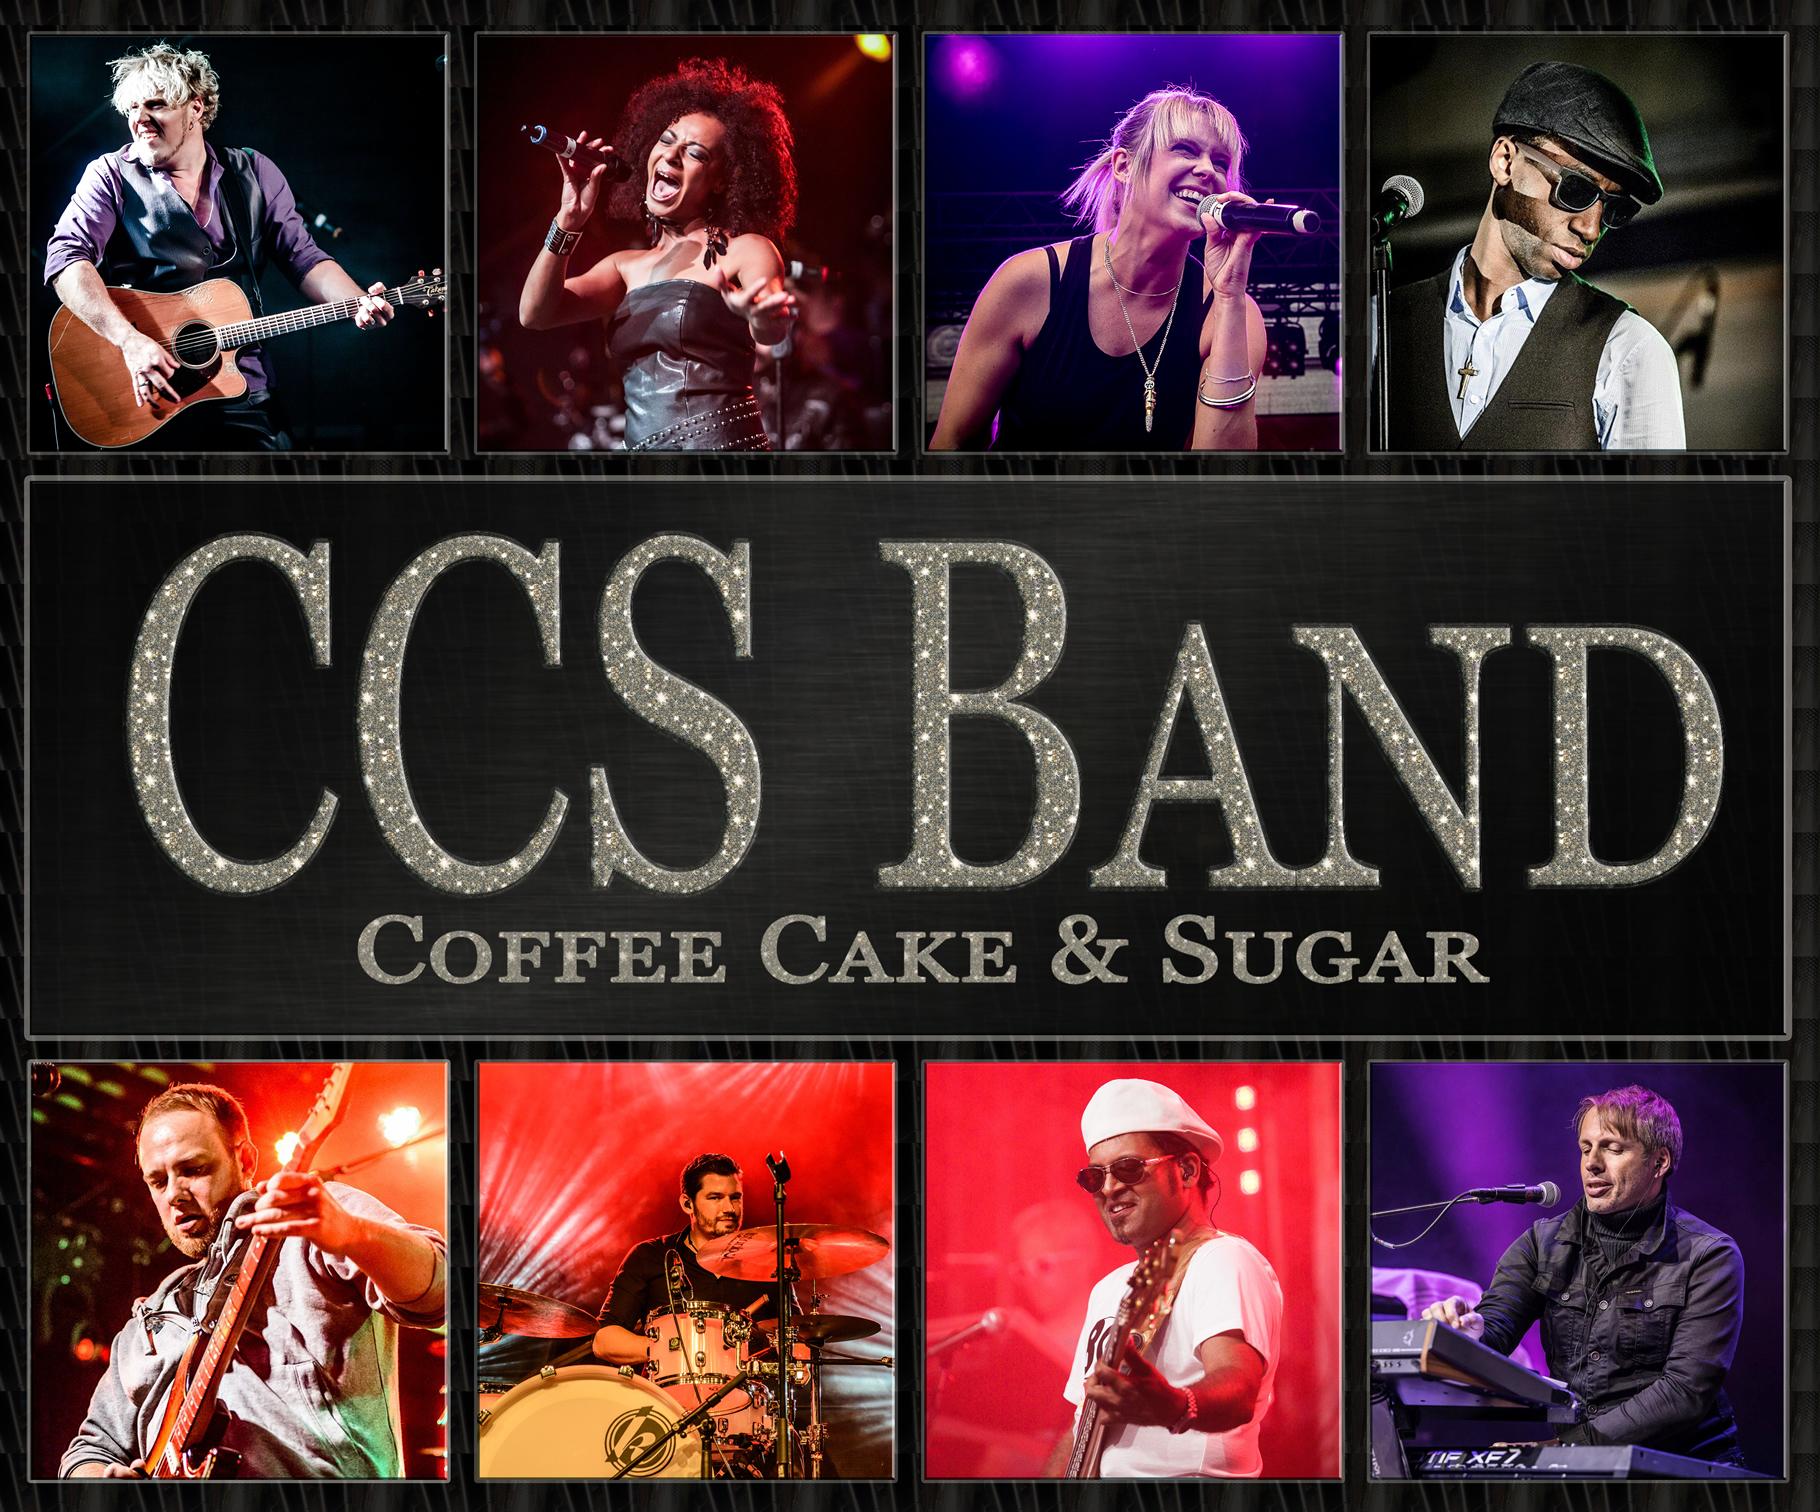 CCS Band – Coffee Cake & Sugar